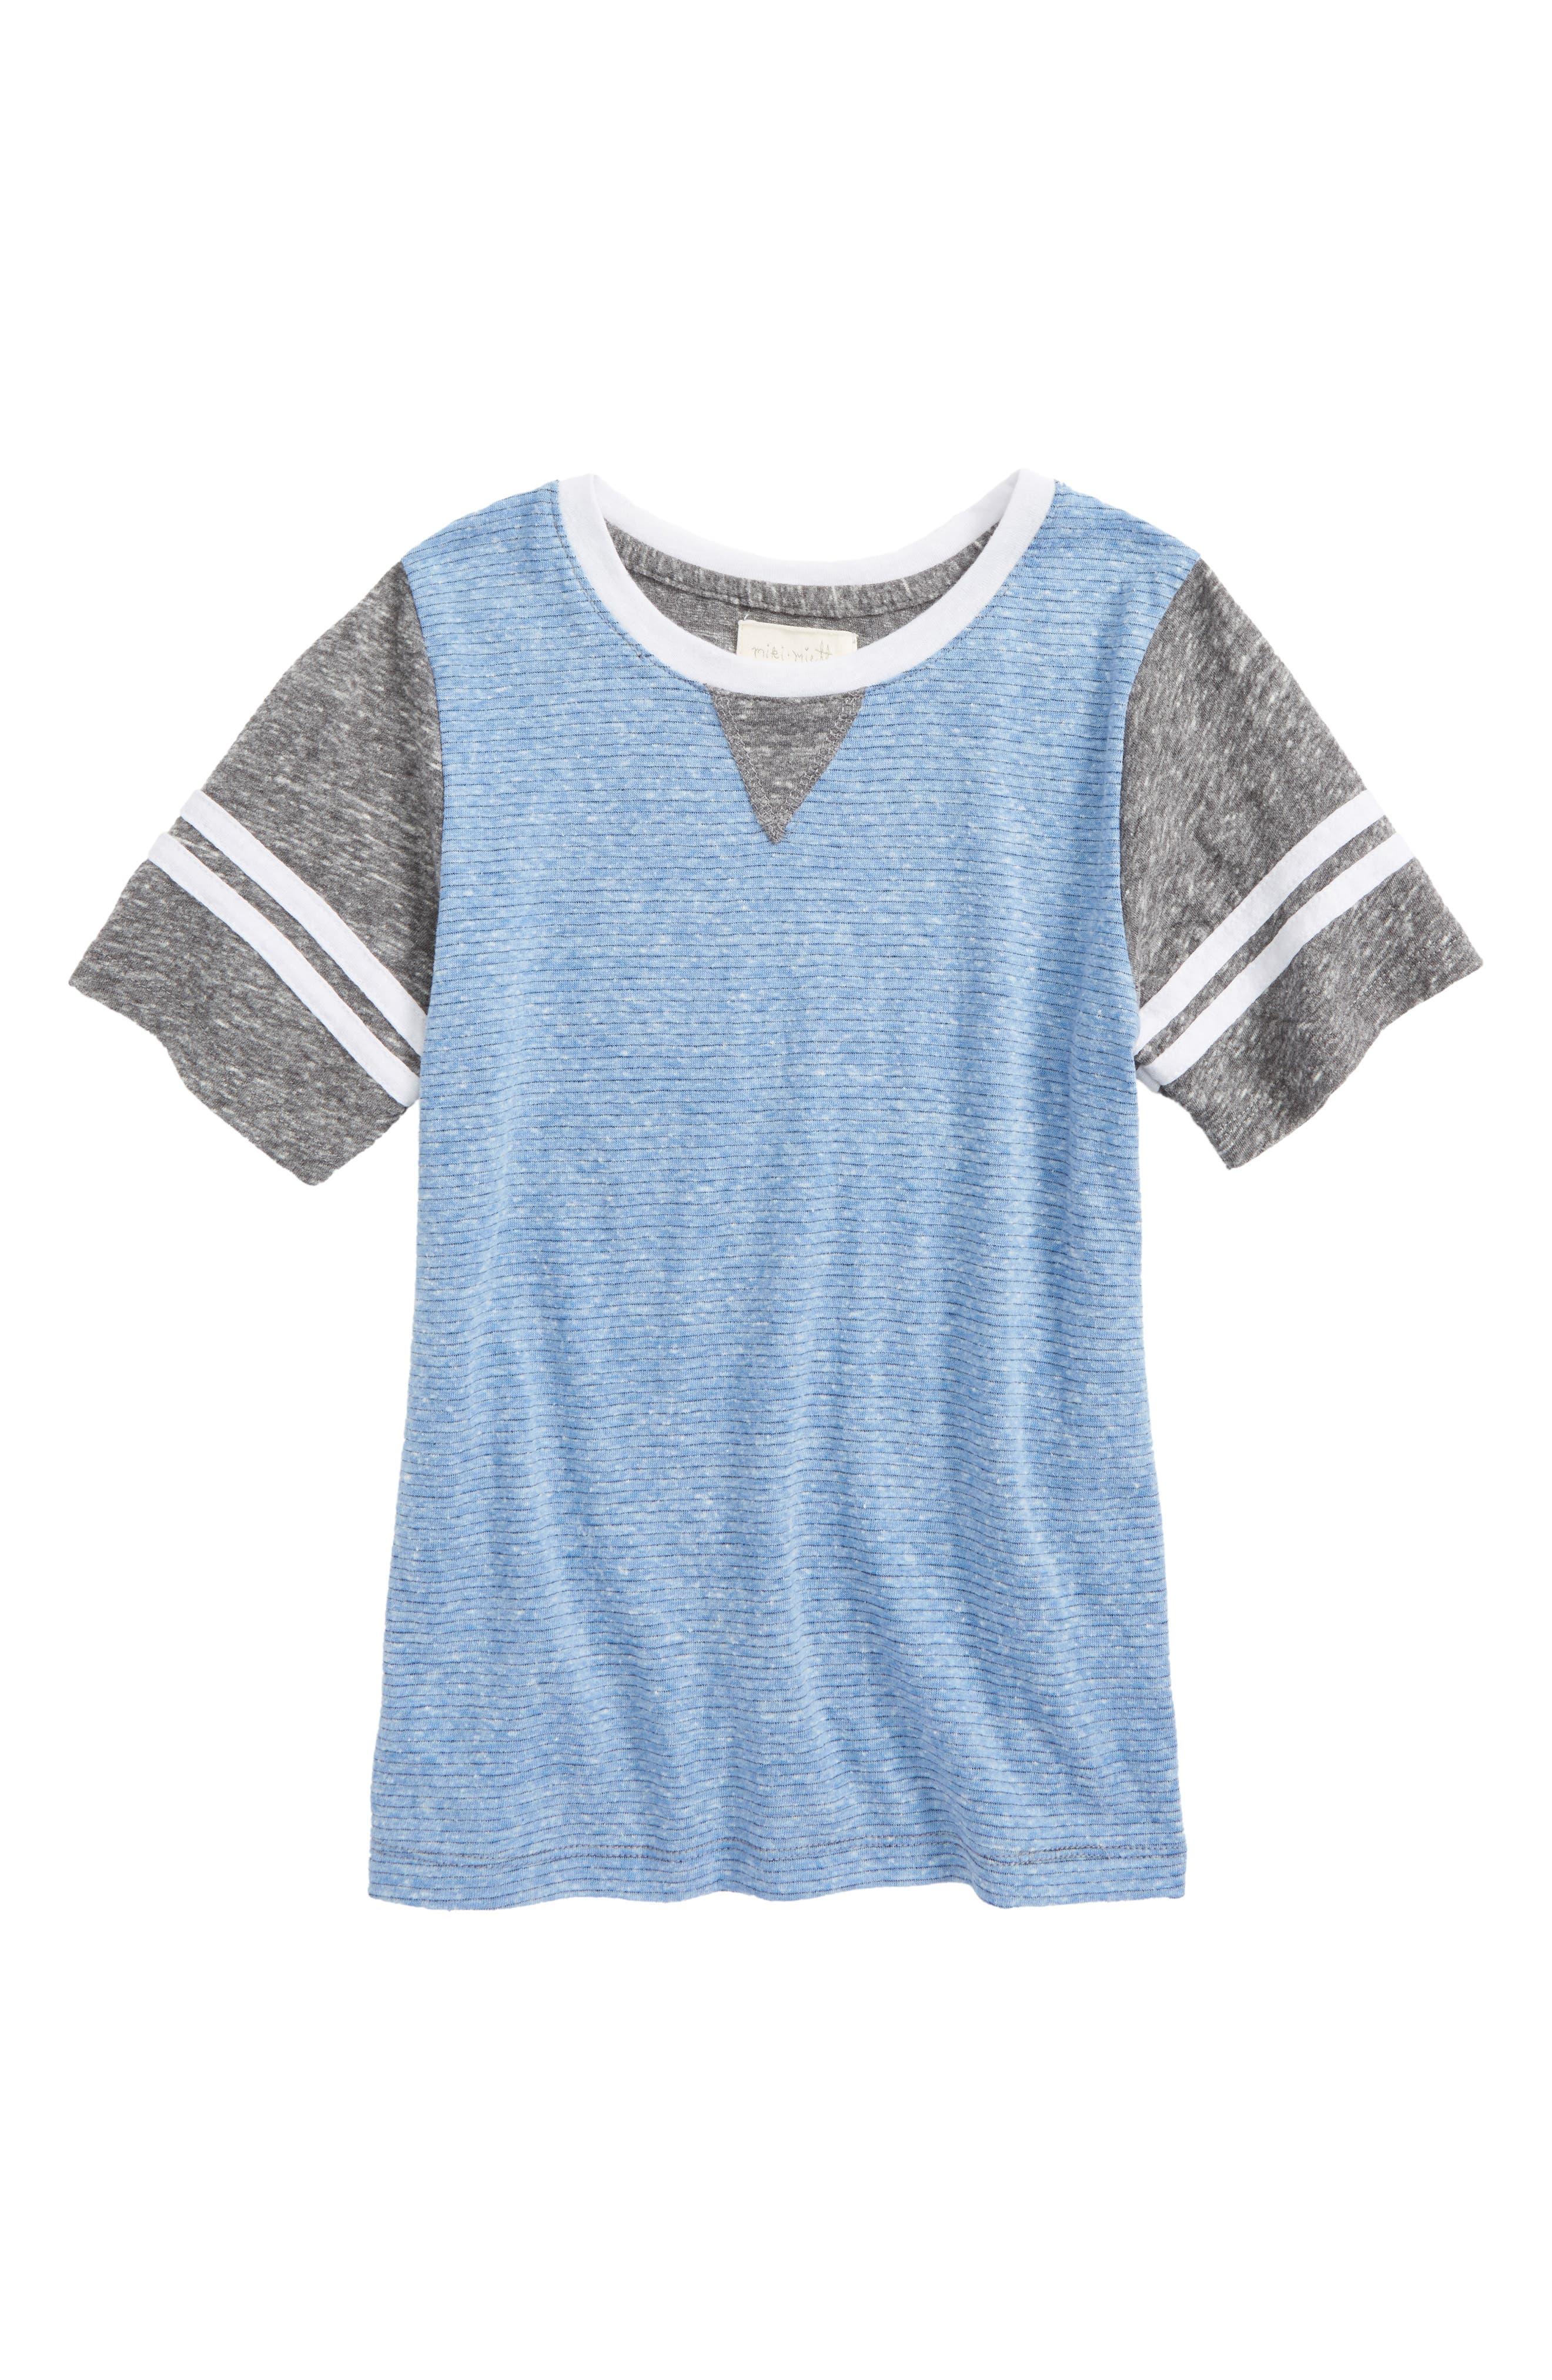 Miki Miette James T-Shirt (Toddler Boys, Little Boys & Big Boys)